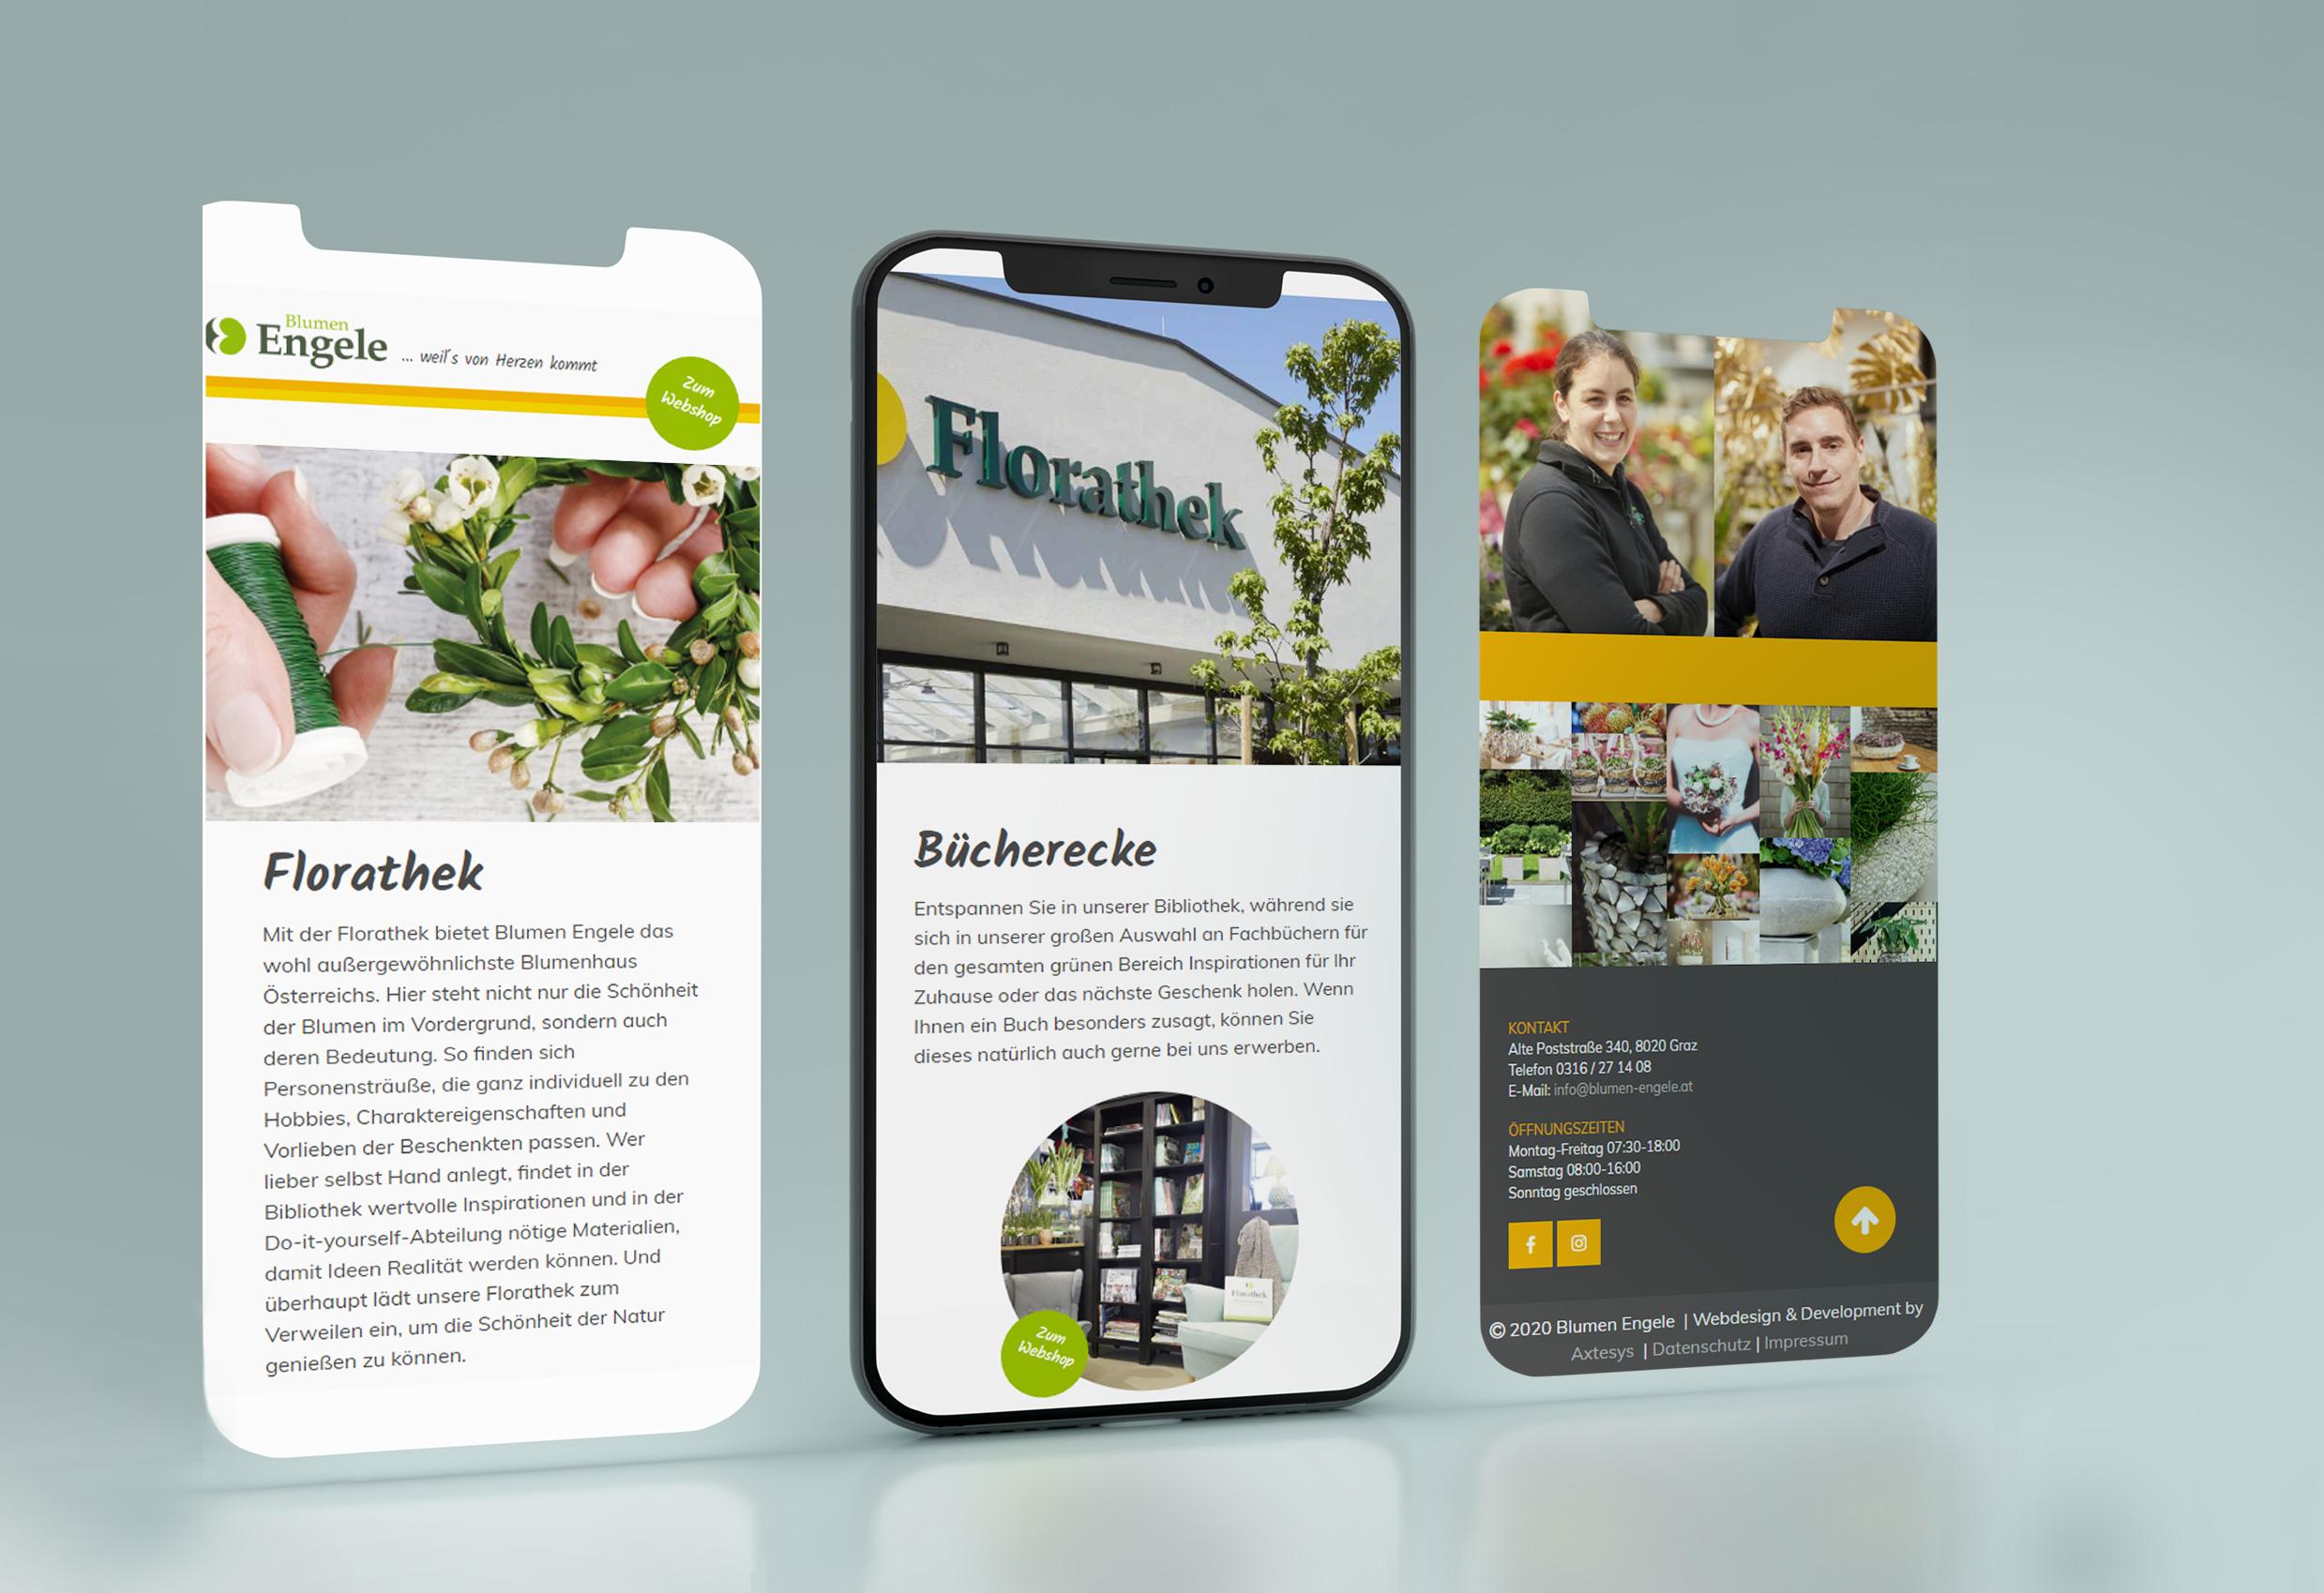 Blumen Engele Website Smartphone